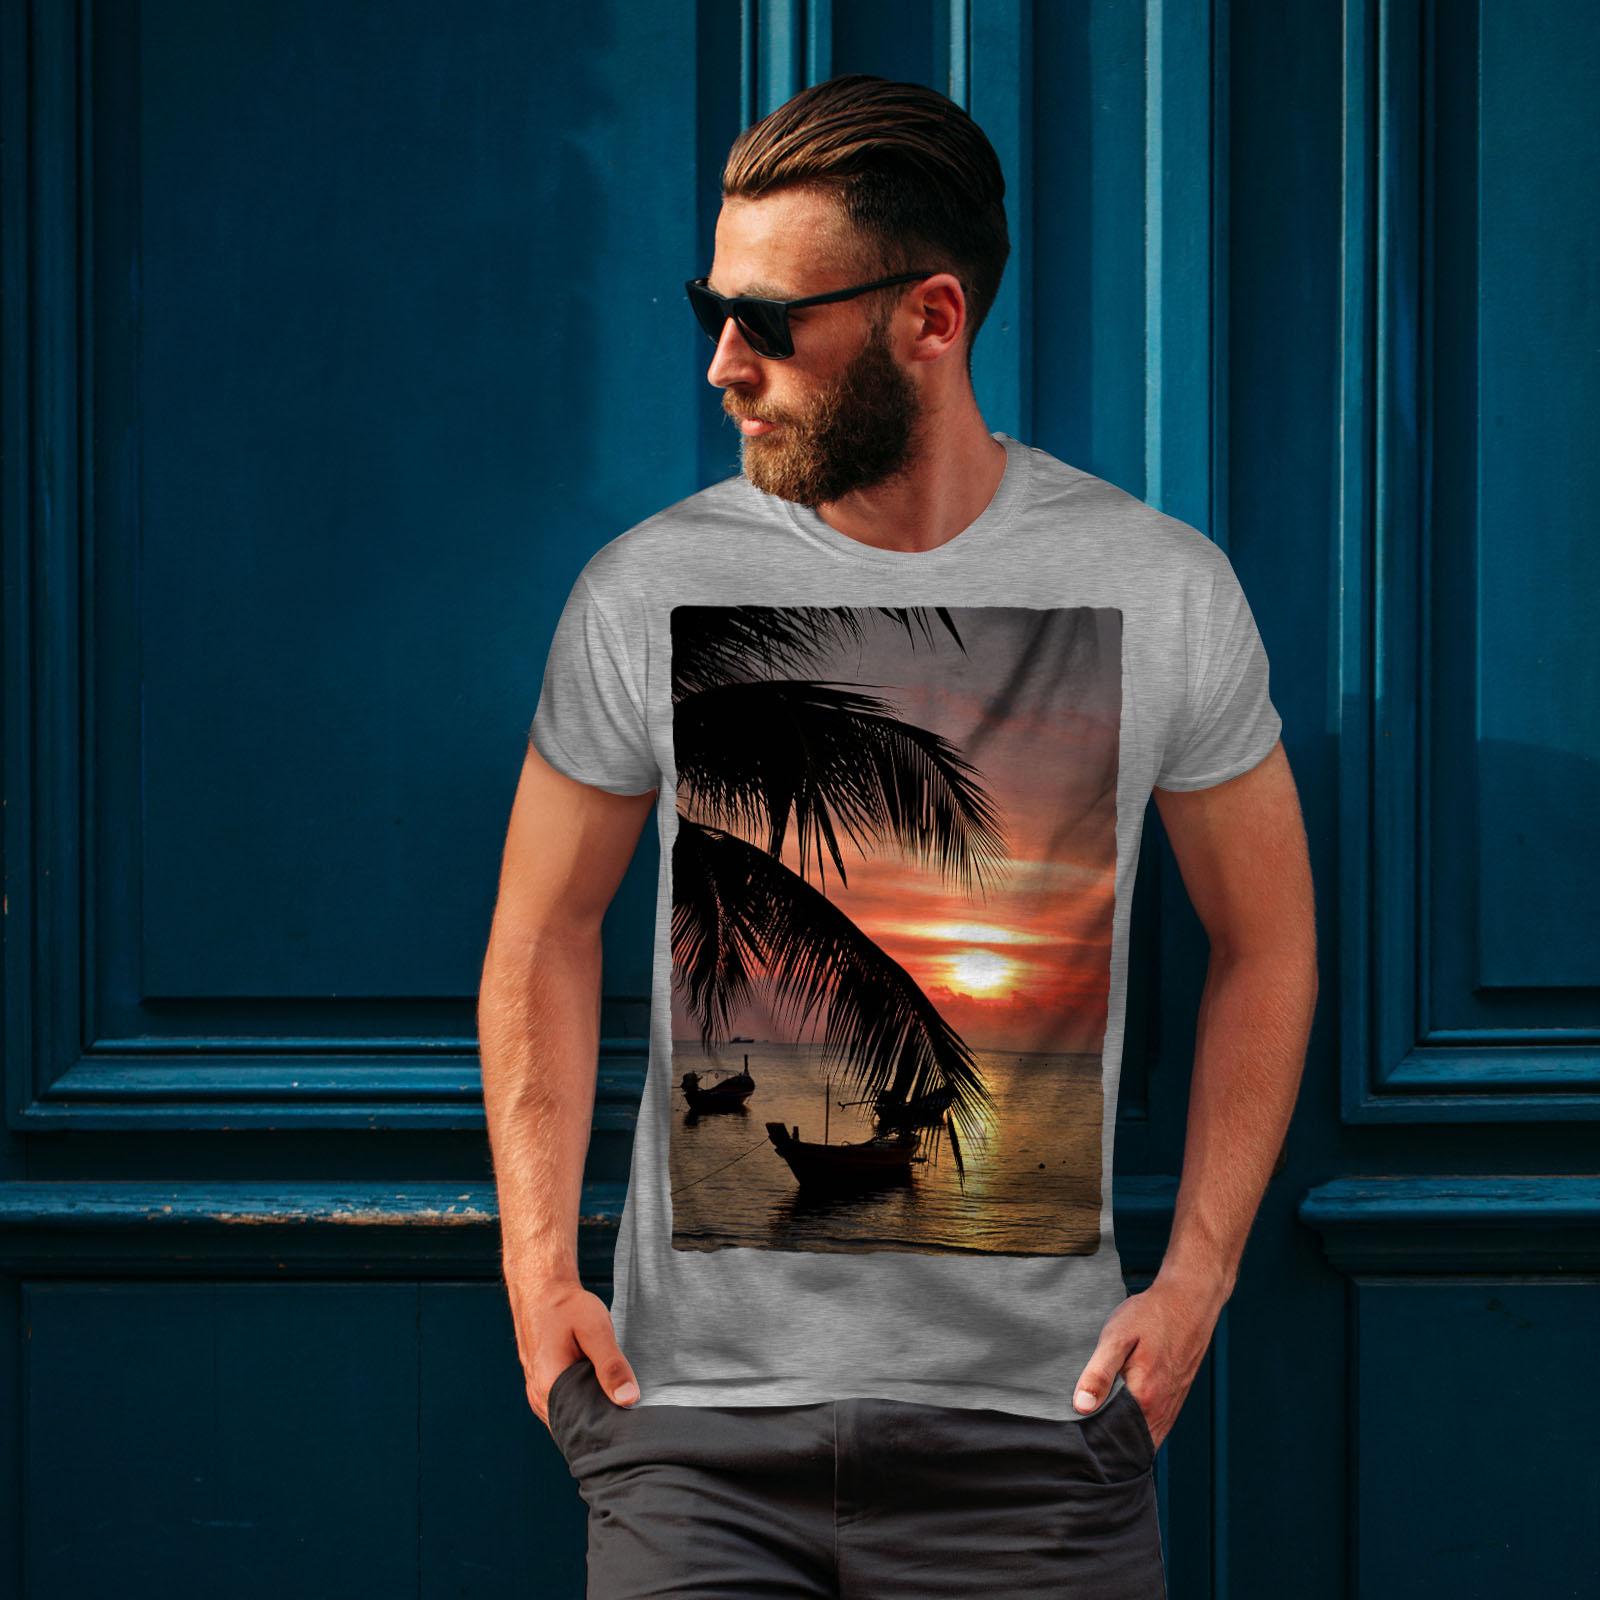 Wellcoda-Sunset-Palm-Tree-Mens-T-shirt-Ocean-Beach-Graphic-Design-Printed-Tee thumbnail 16